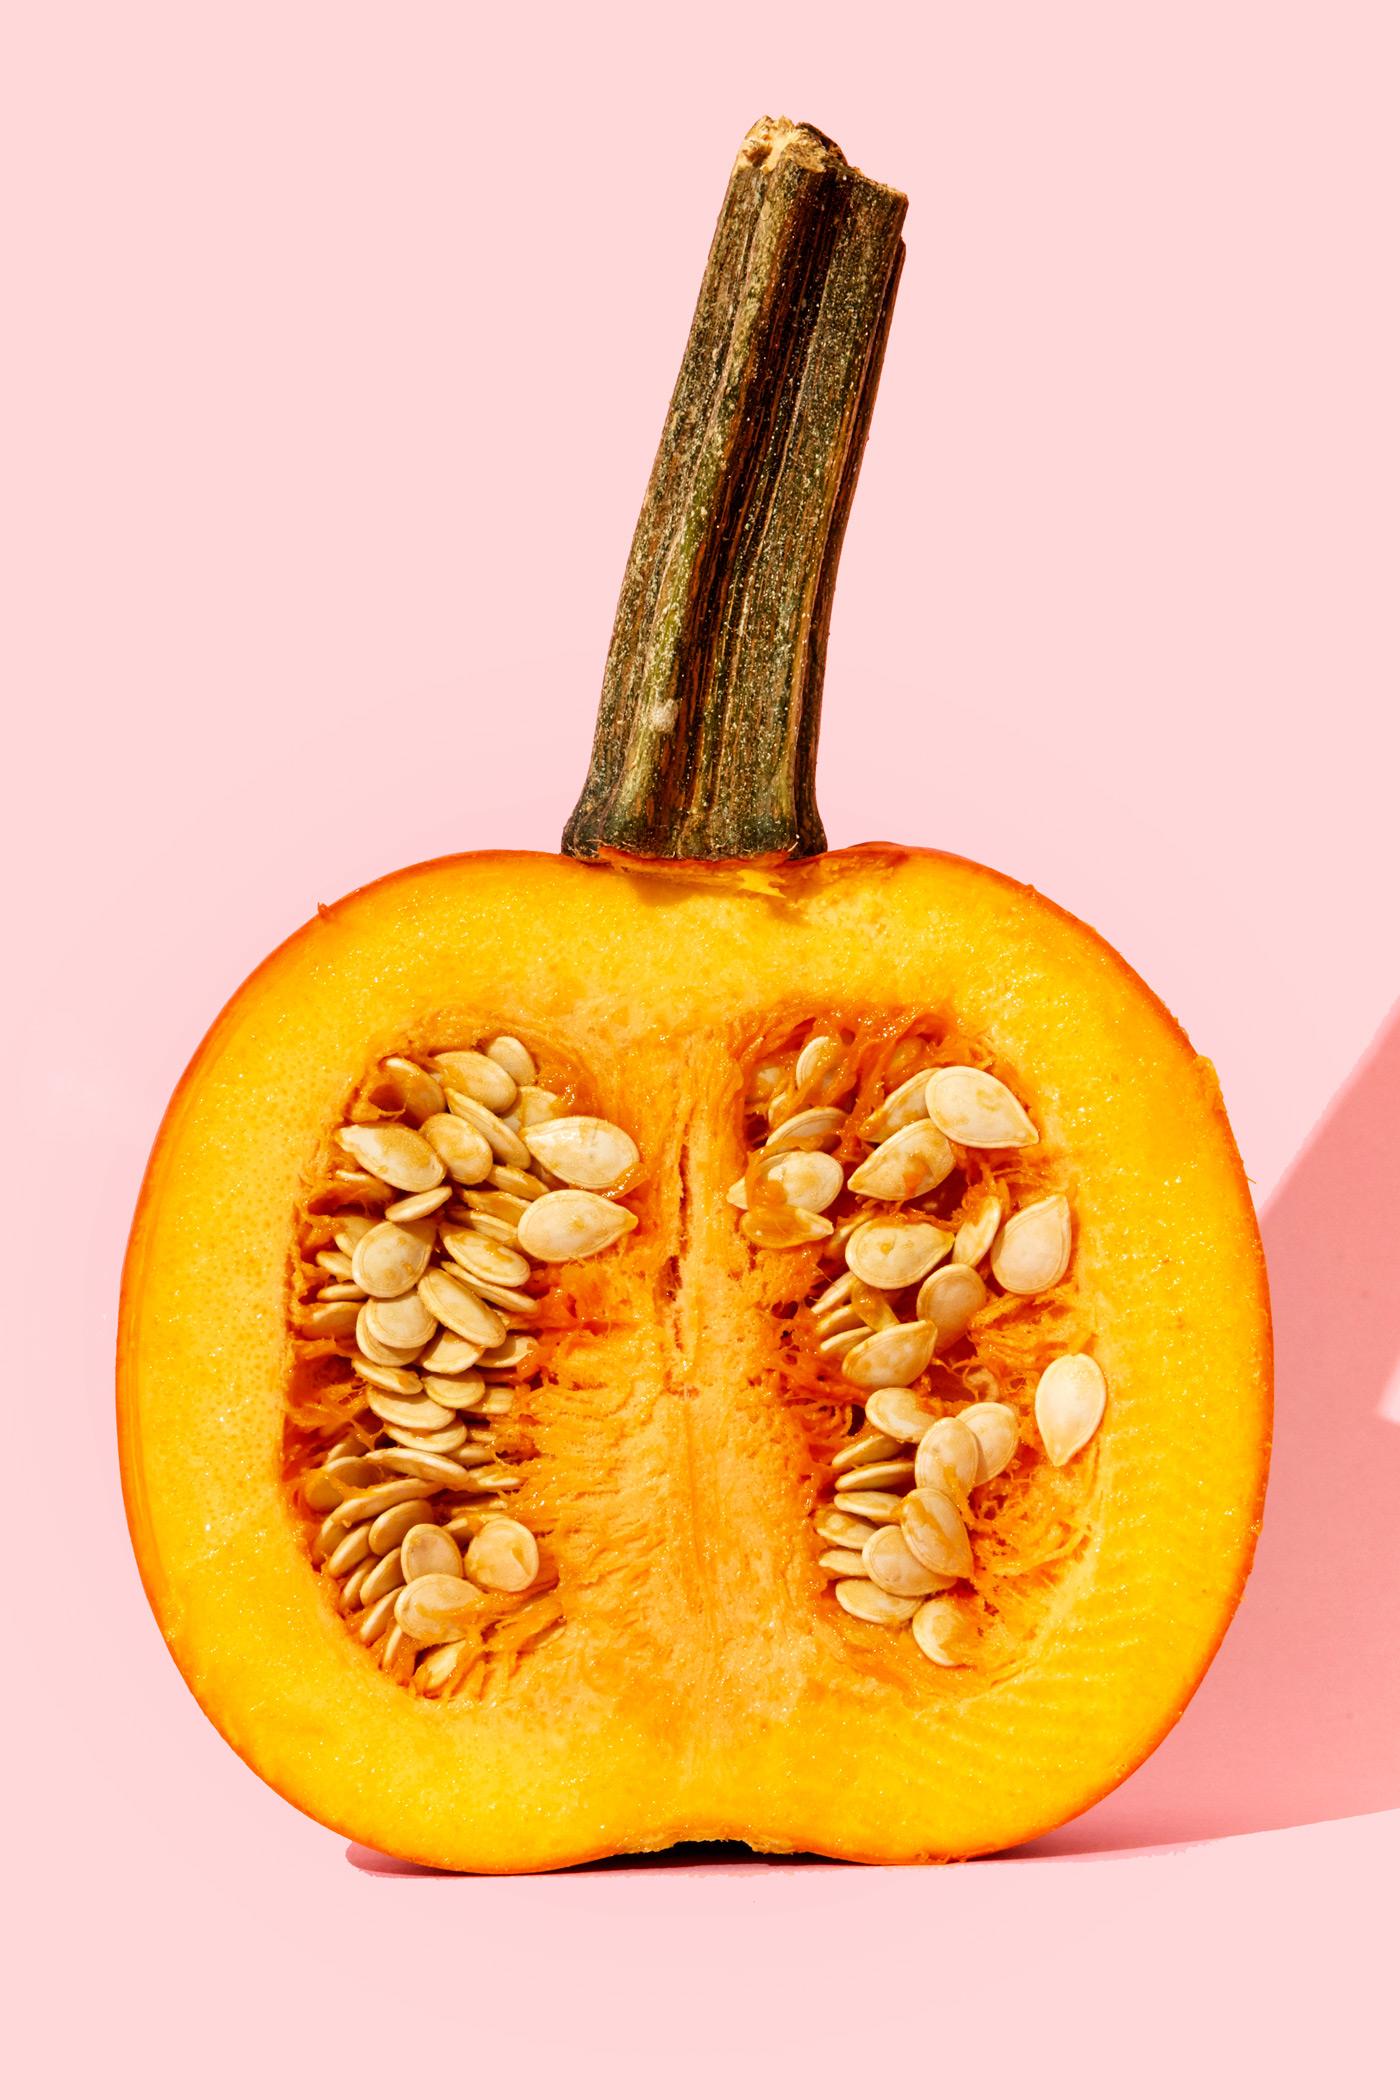 healthiest foods, health food, diet, nutrition, time.com stock, pumpkin